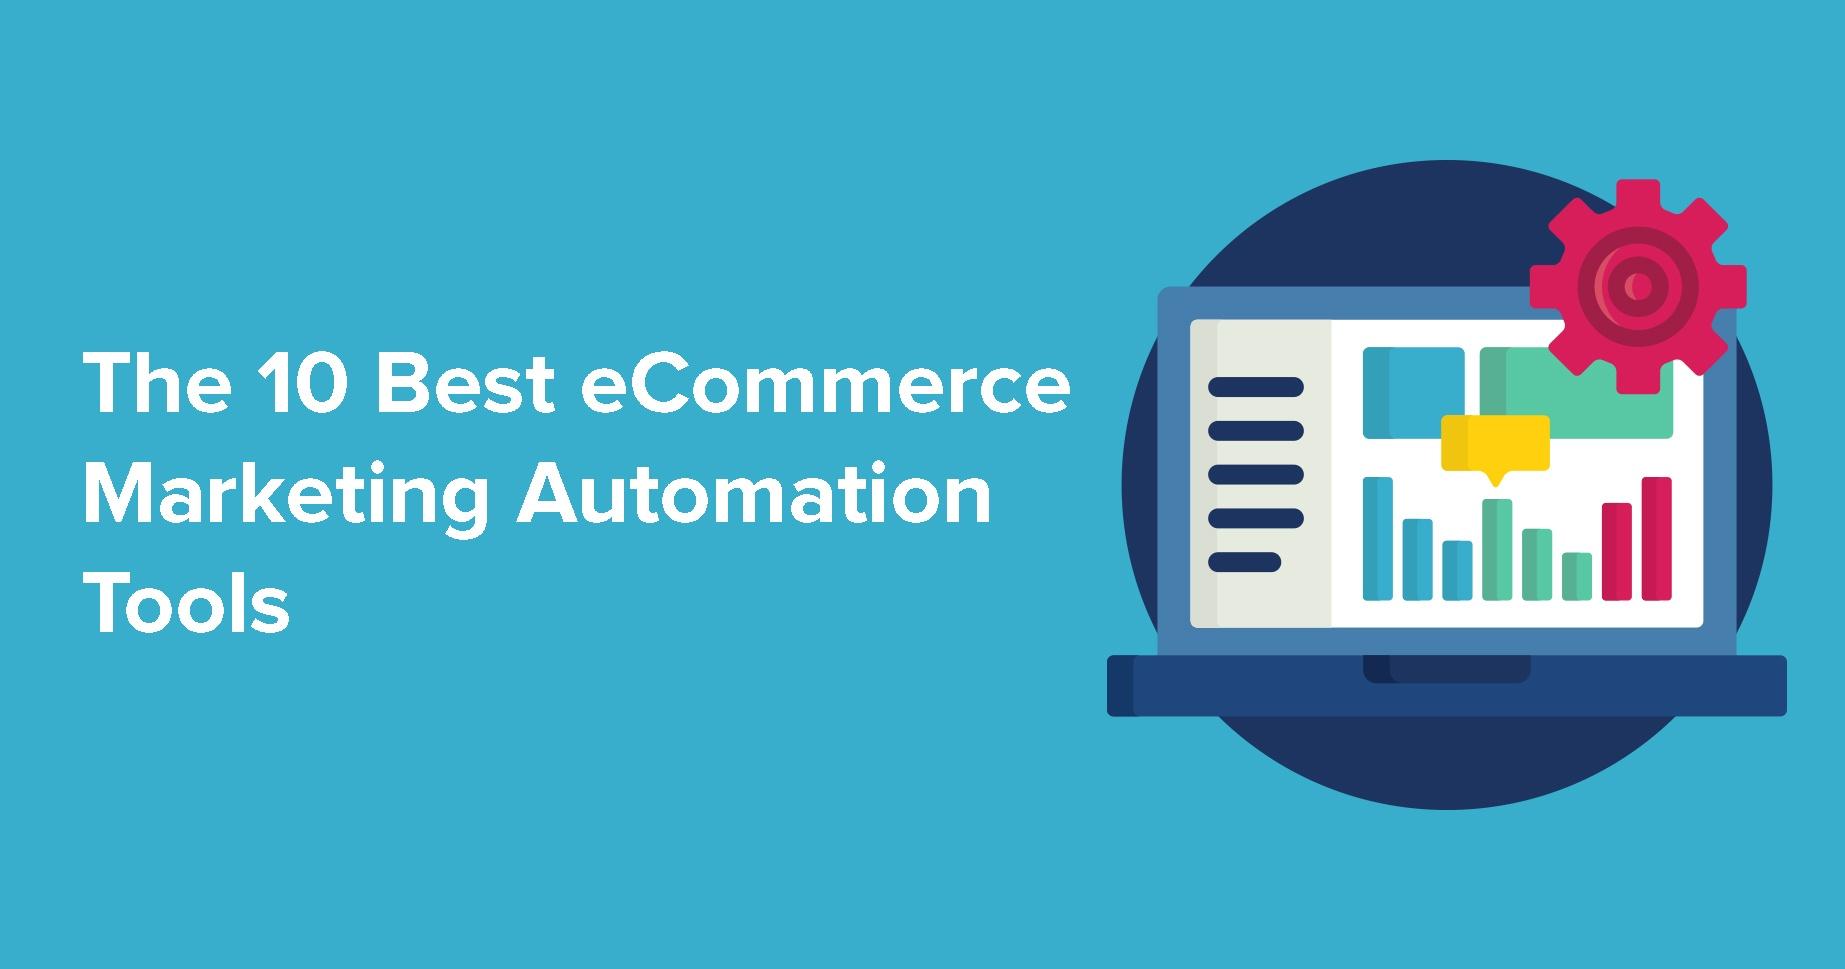 Tips to Choose a Marketing Automation Platform